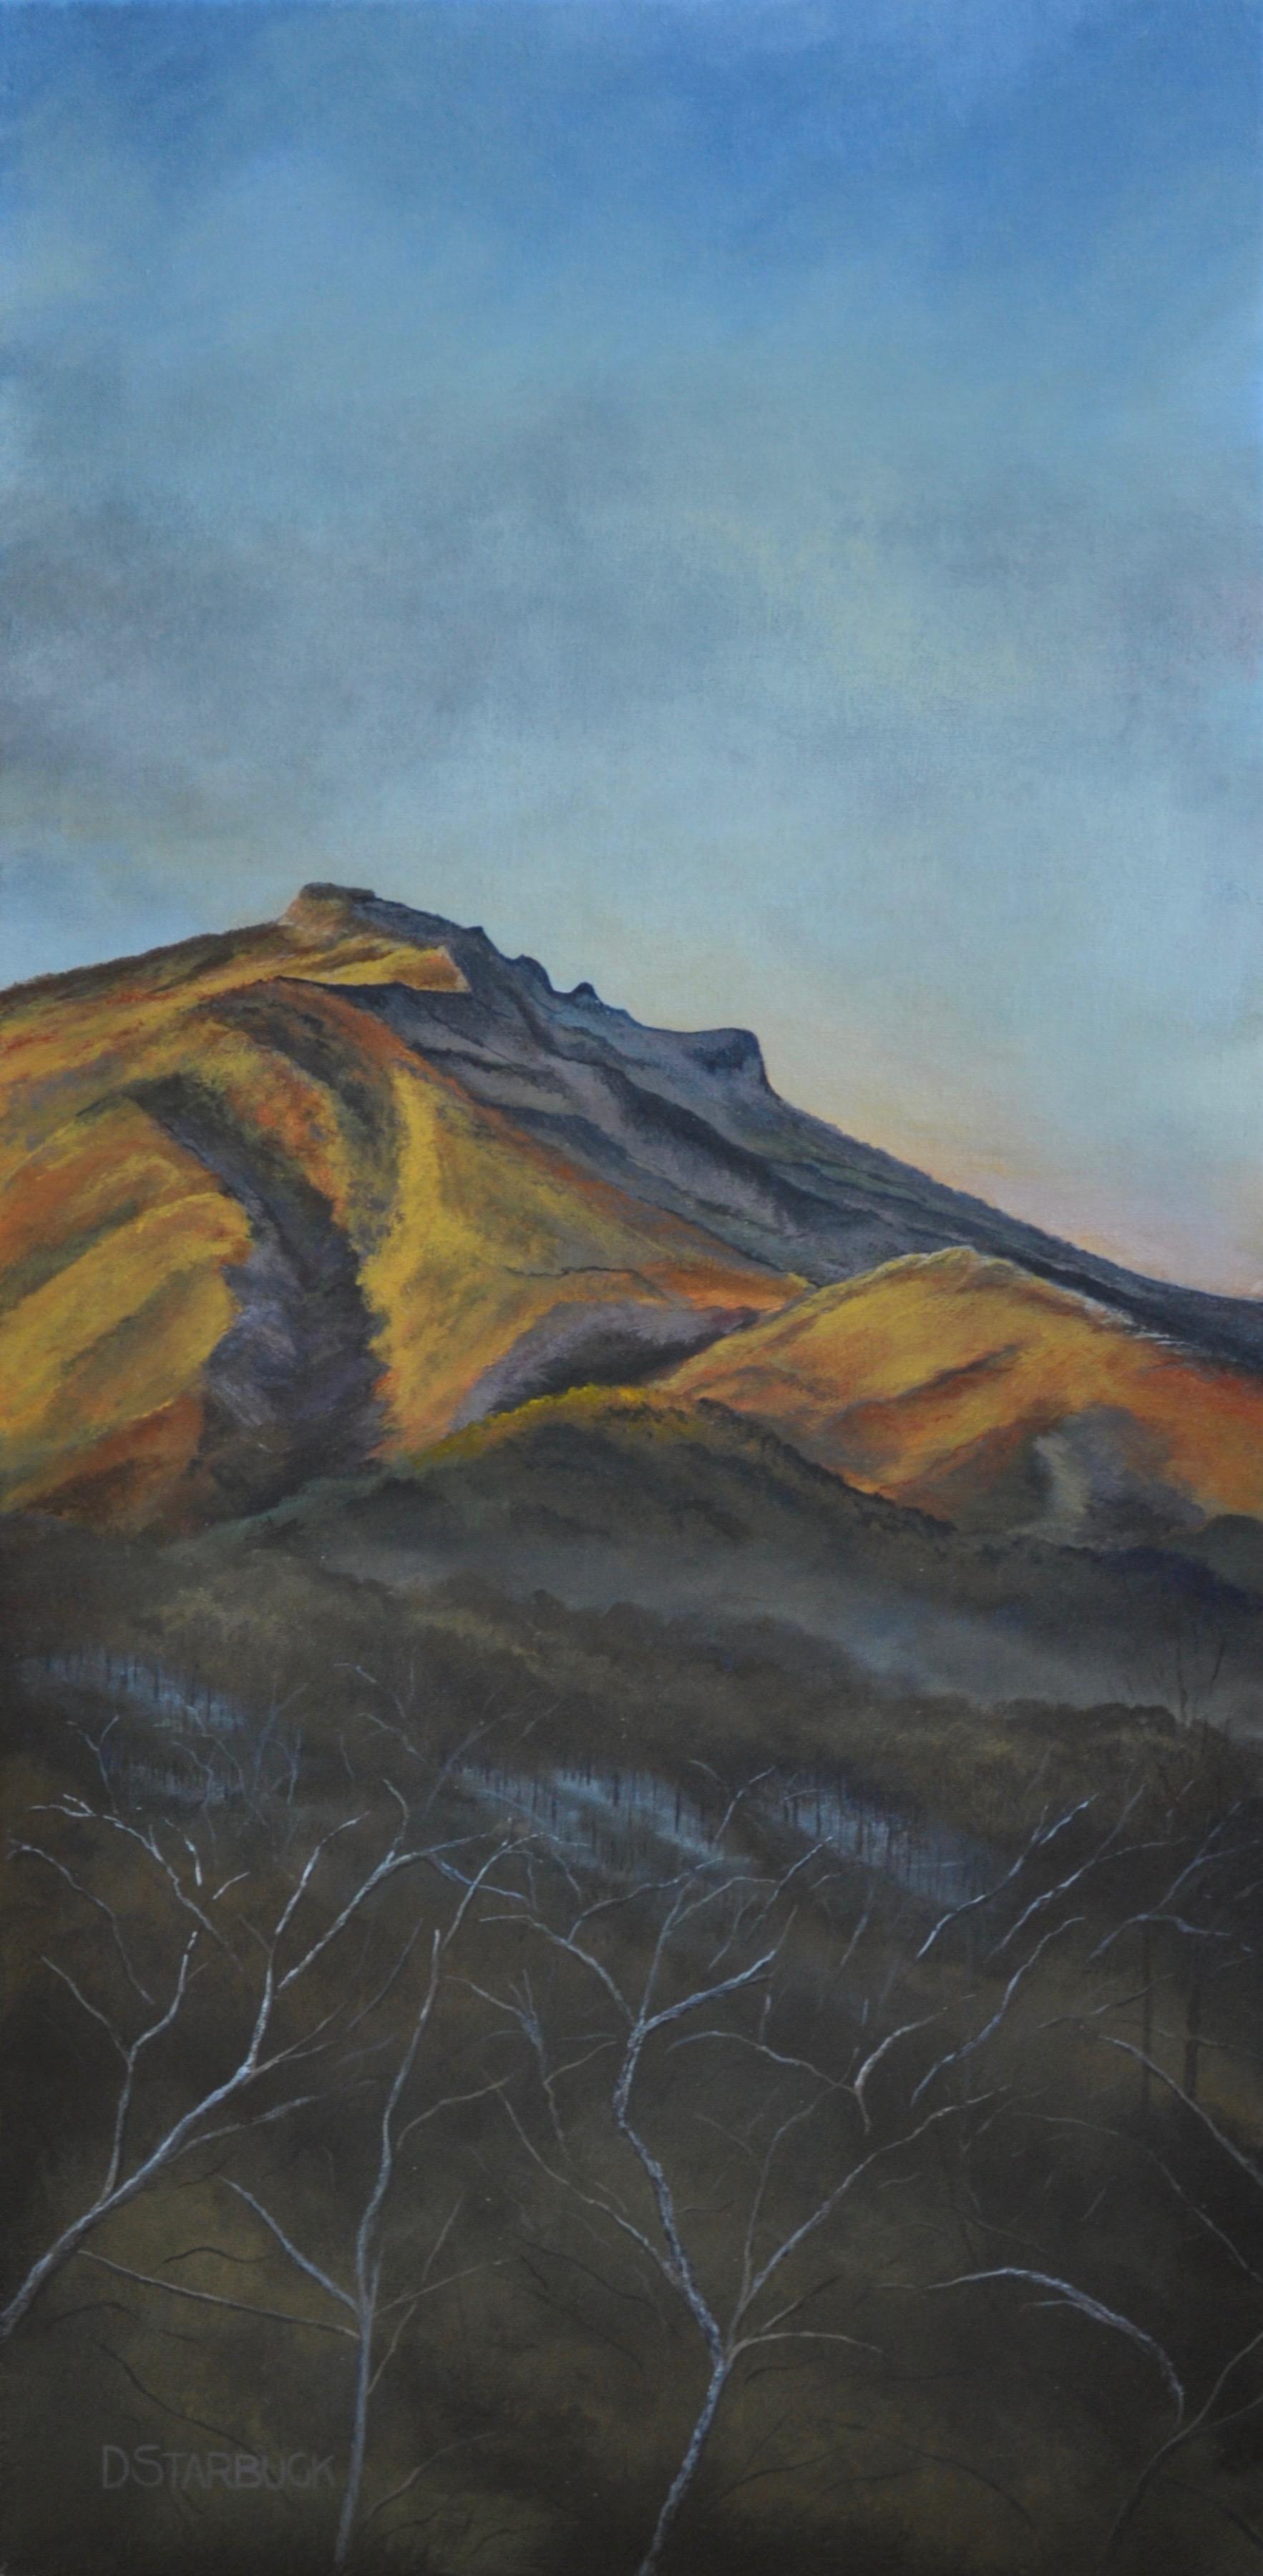 """A Slice of Grandfather Mountain"" Blowing Rock, North Carolina  Original: Acrylic on Linen, 12"" x 24"""